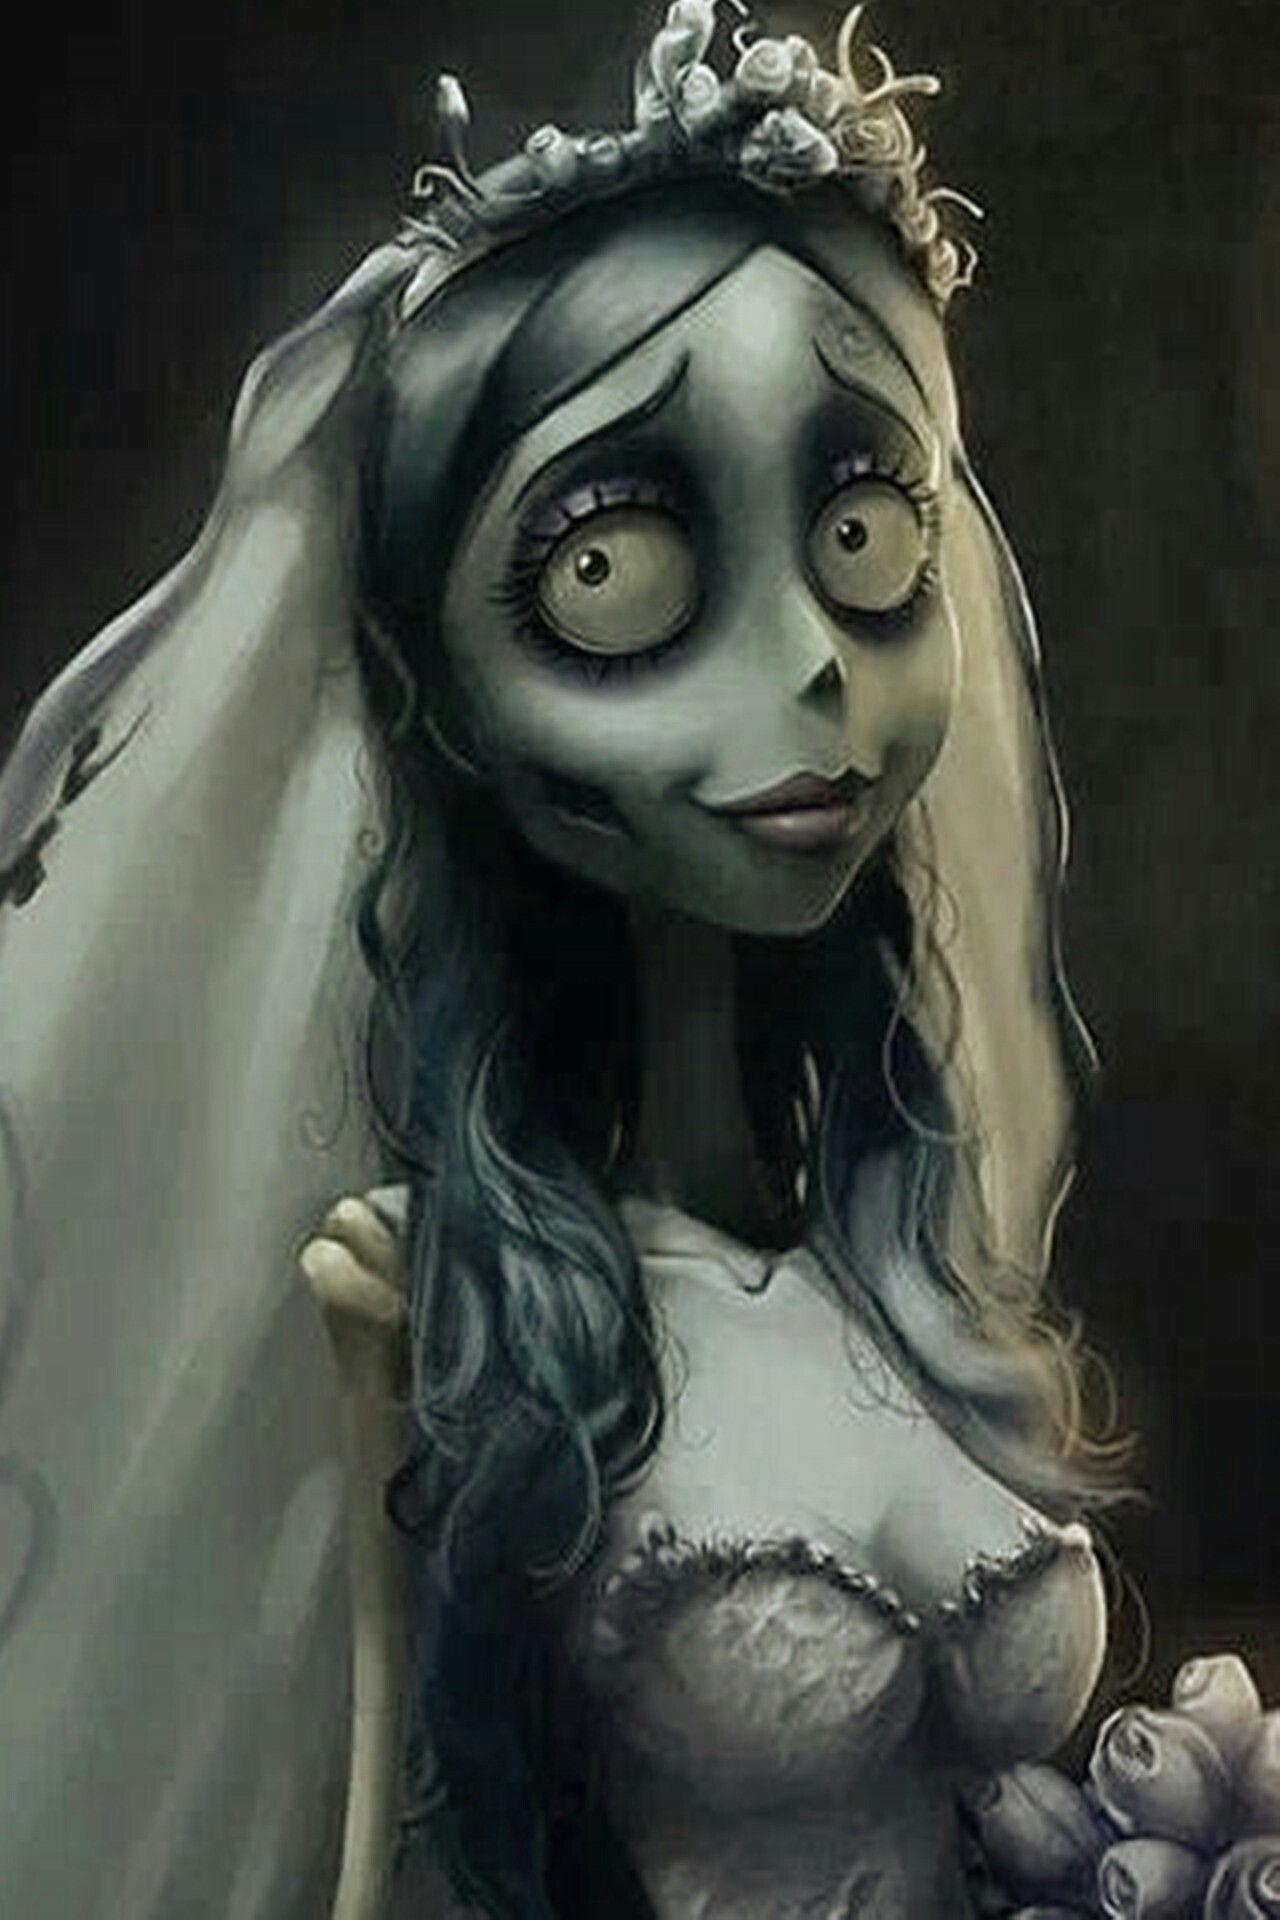 Emily Corpse Bride C Tim Burton Warner Bros Pictures Tim Burton Corpse Bride Corpse Bride Corpse Bride Art